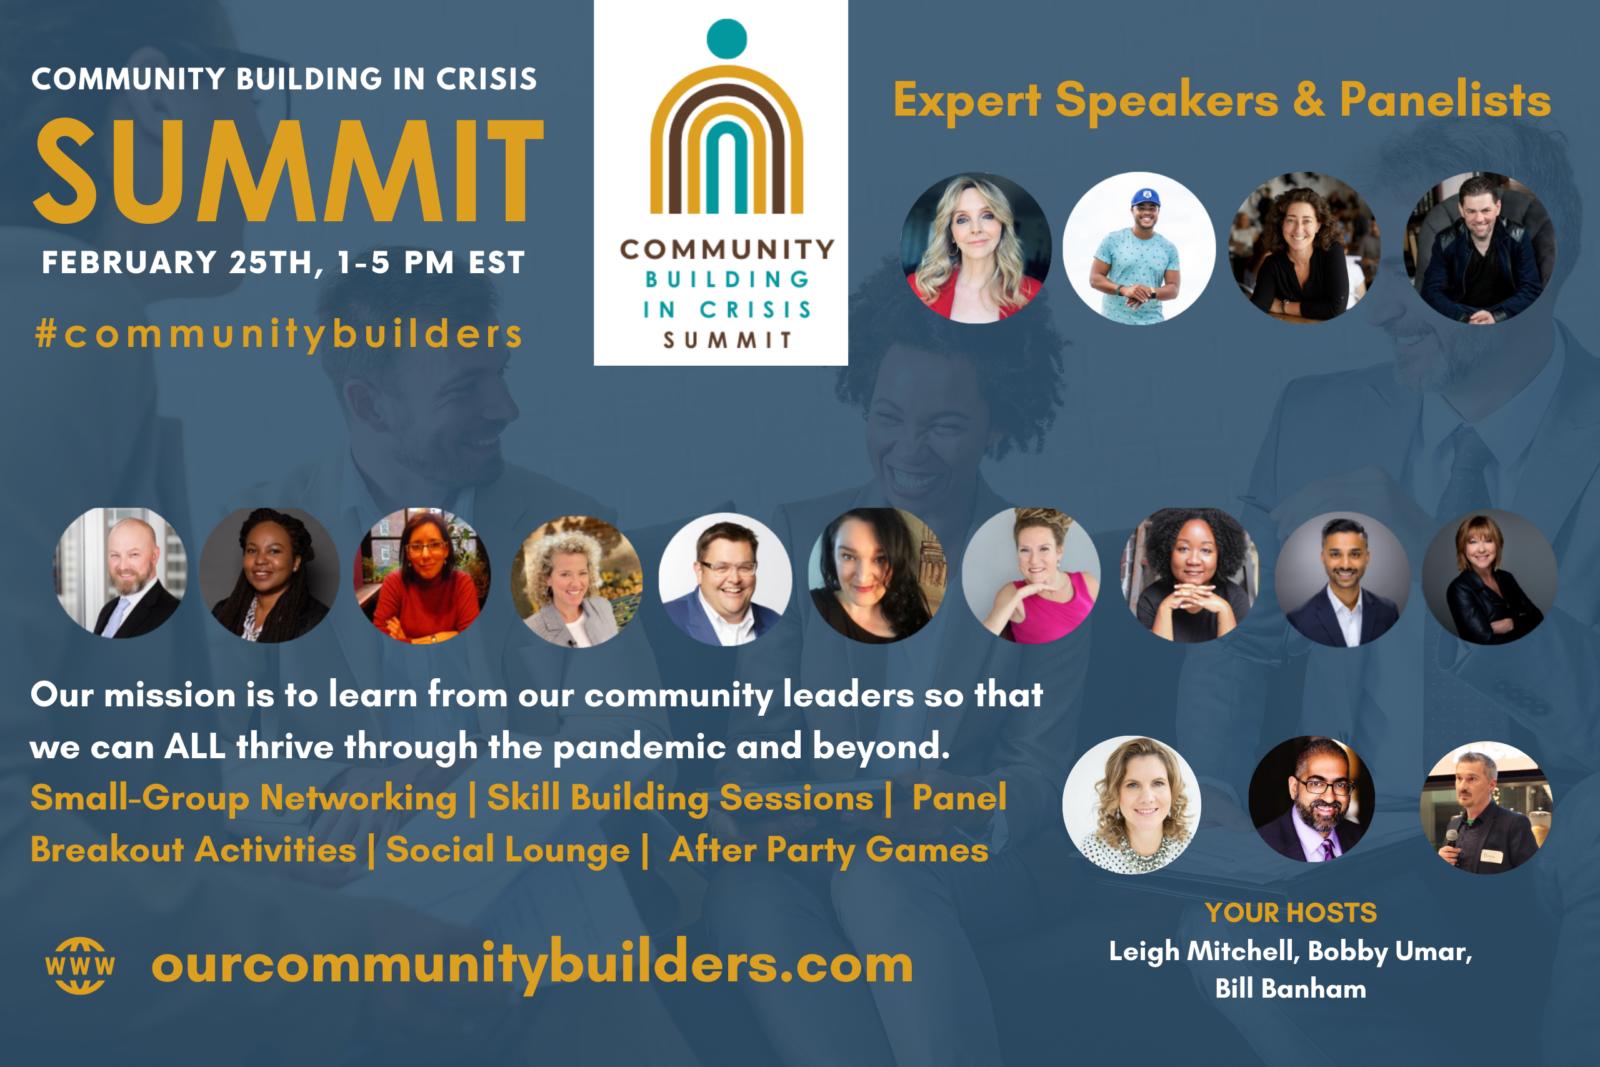 Community Building in Crisis Summit